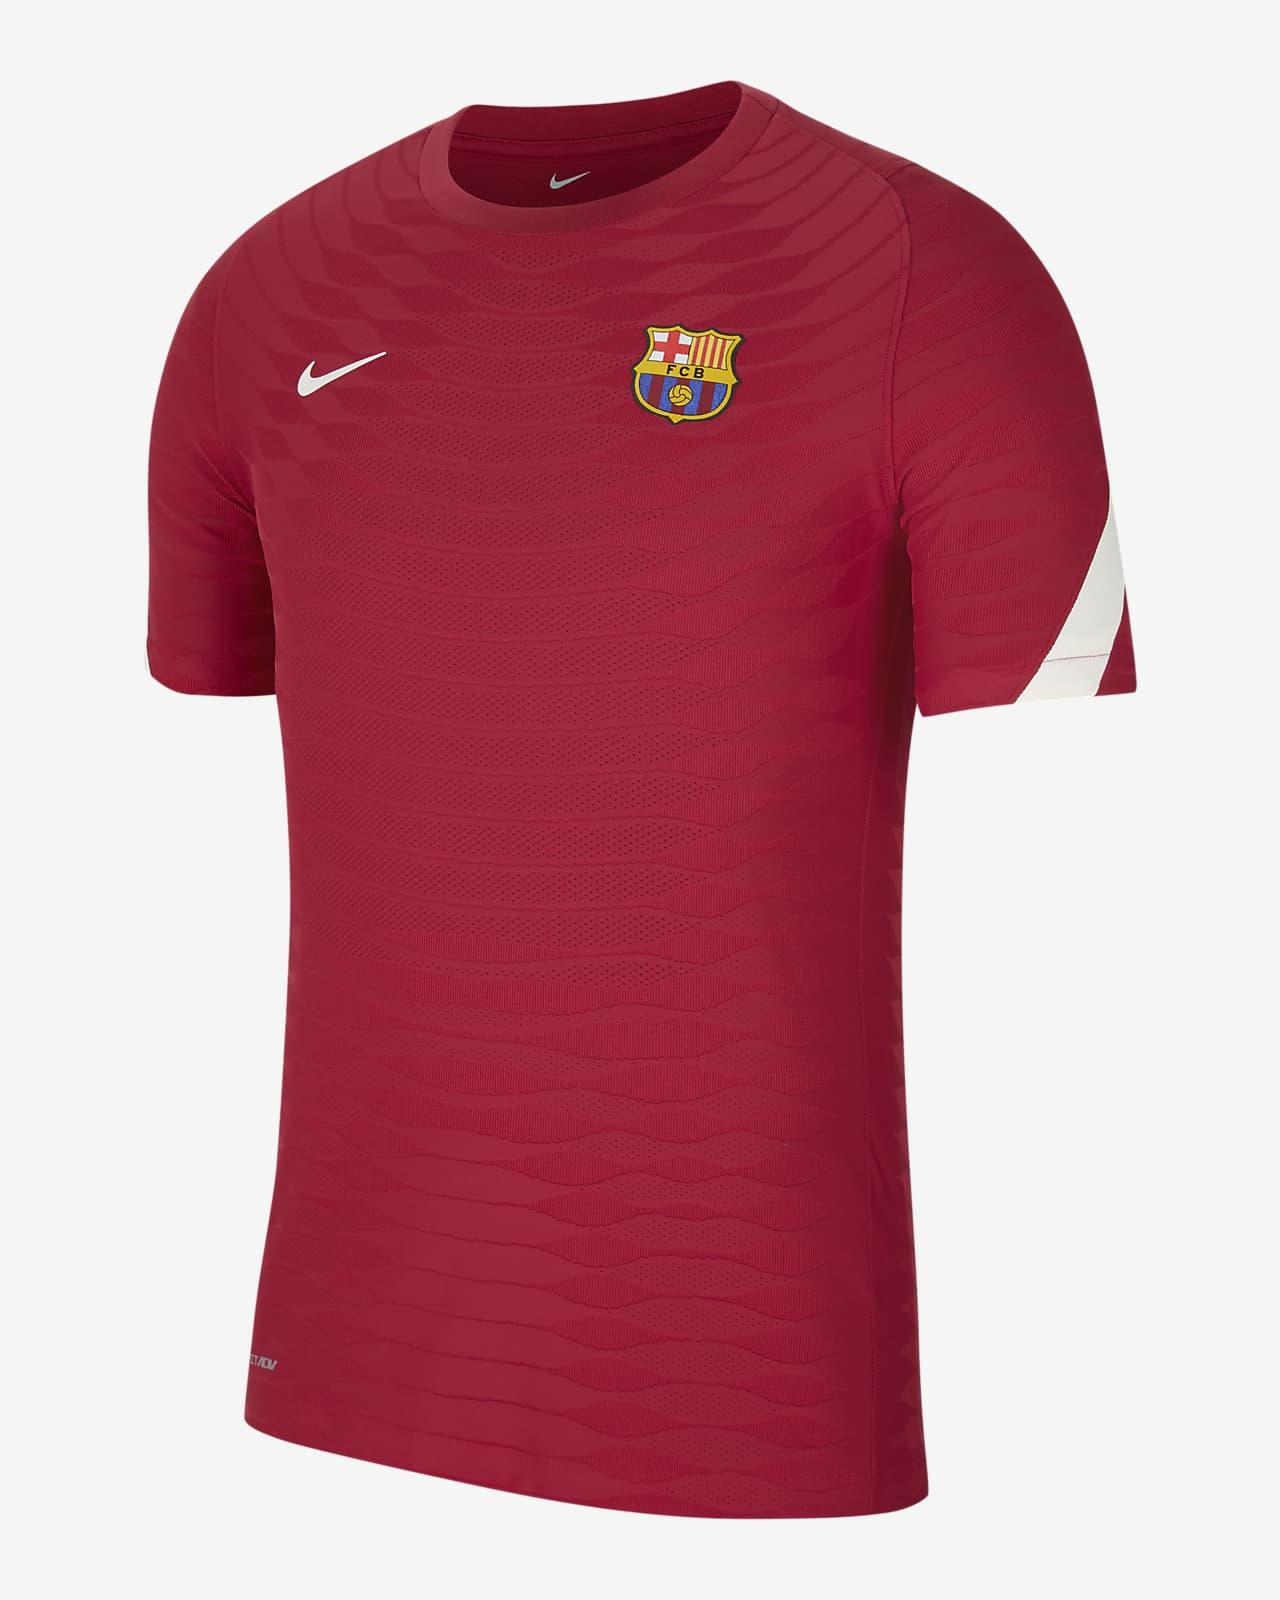 F.C. Barcelona Elite Men's Nike Dri-FIT ADV Short-Sleeve Football Top